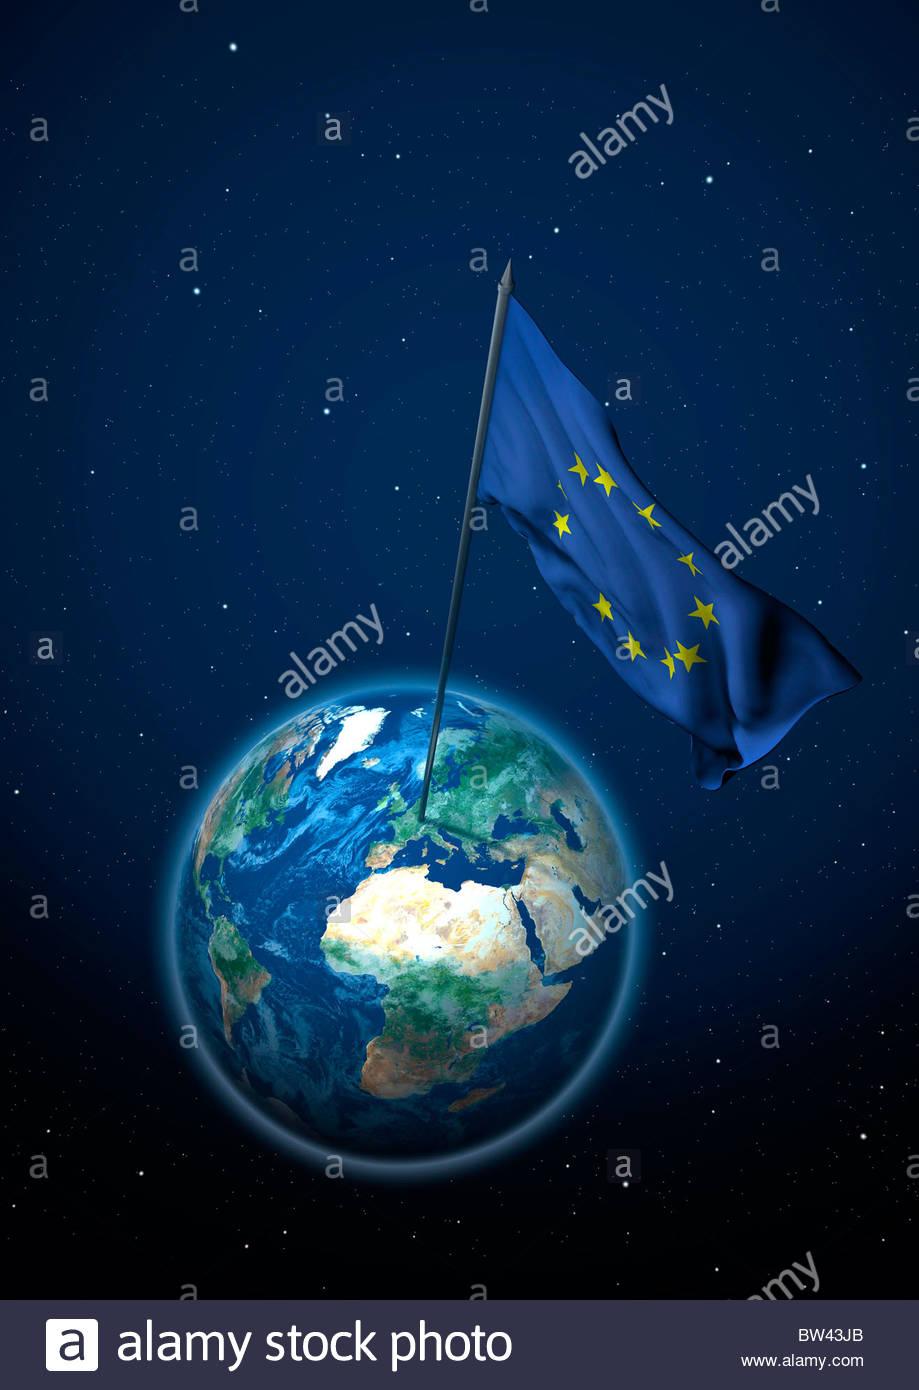 Flag of the European Union - Stock Image